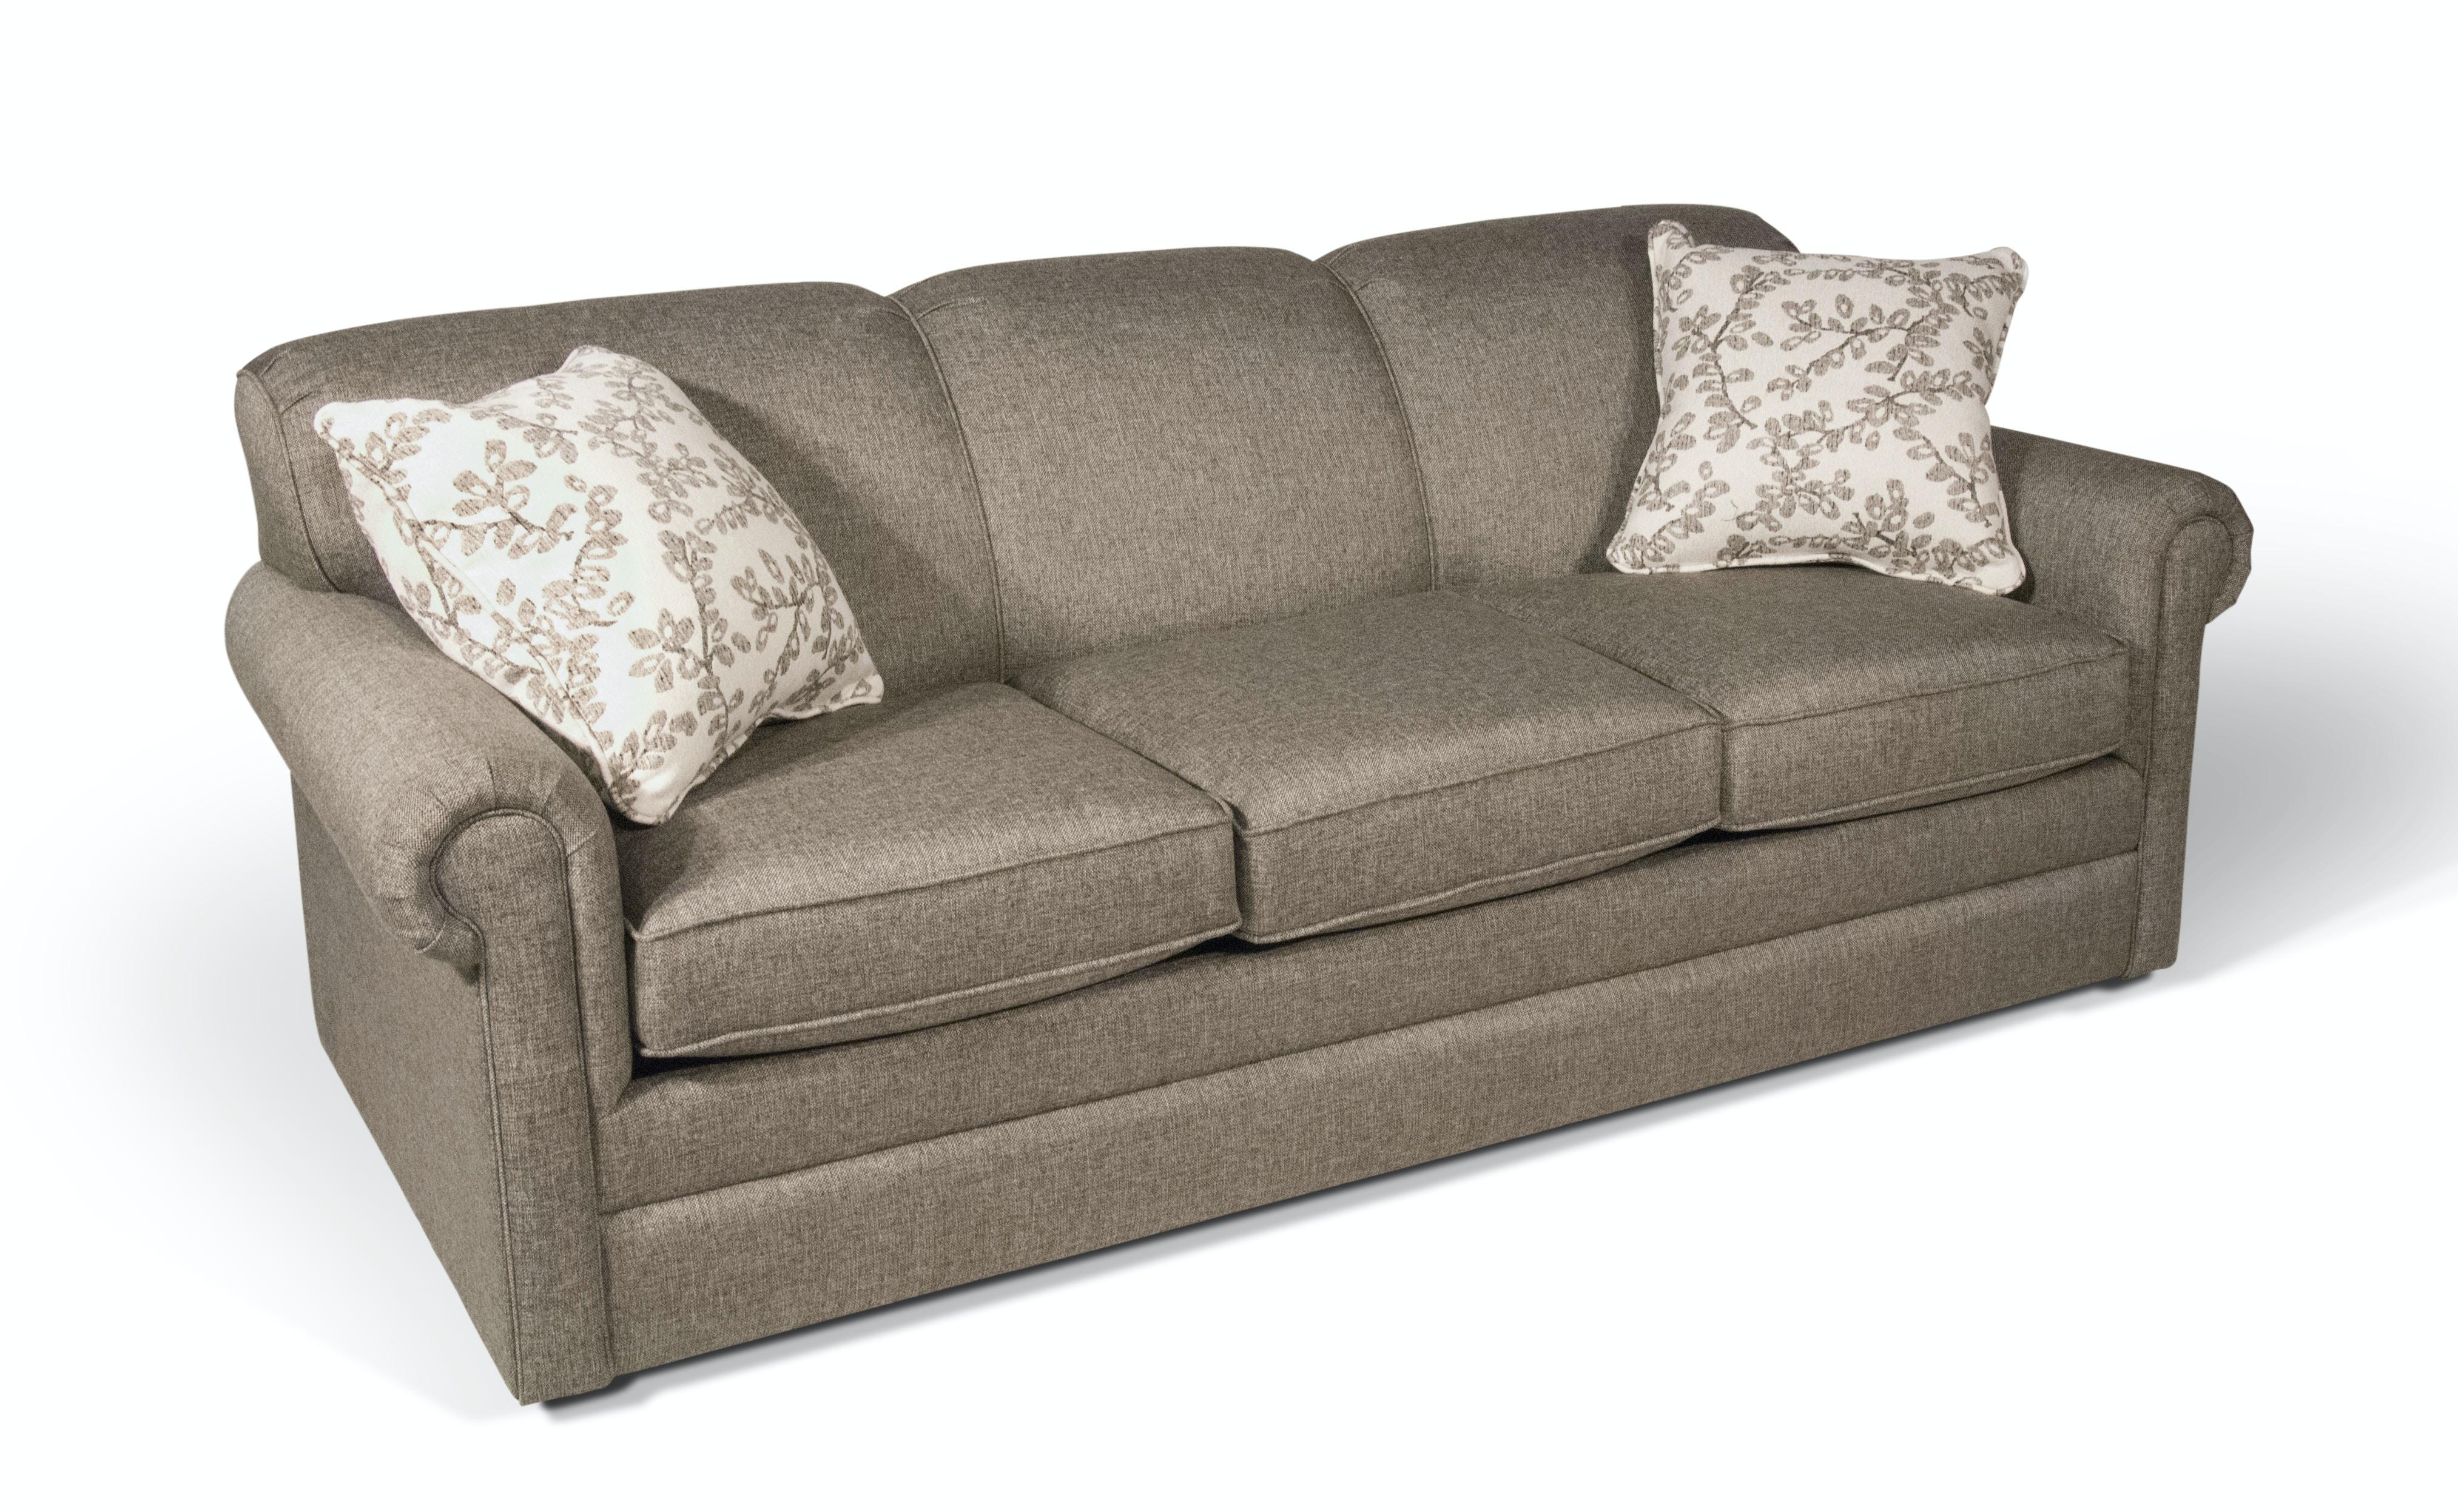 Greece Queen Sleeper Sofa